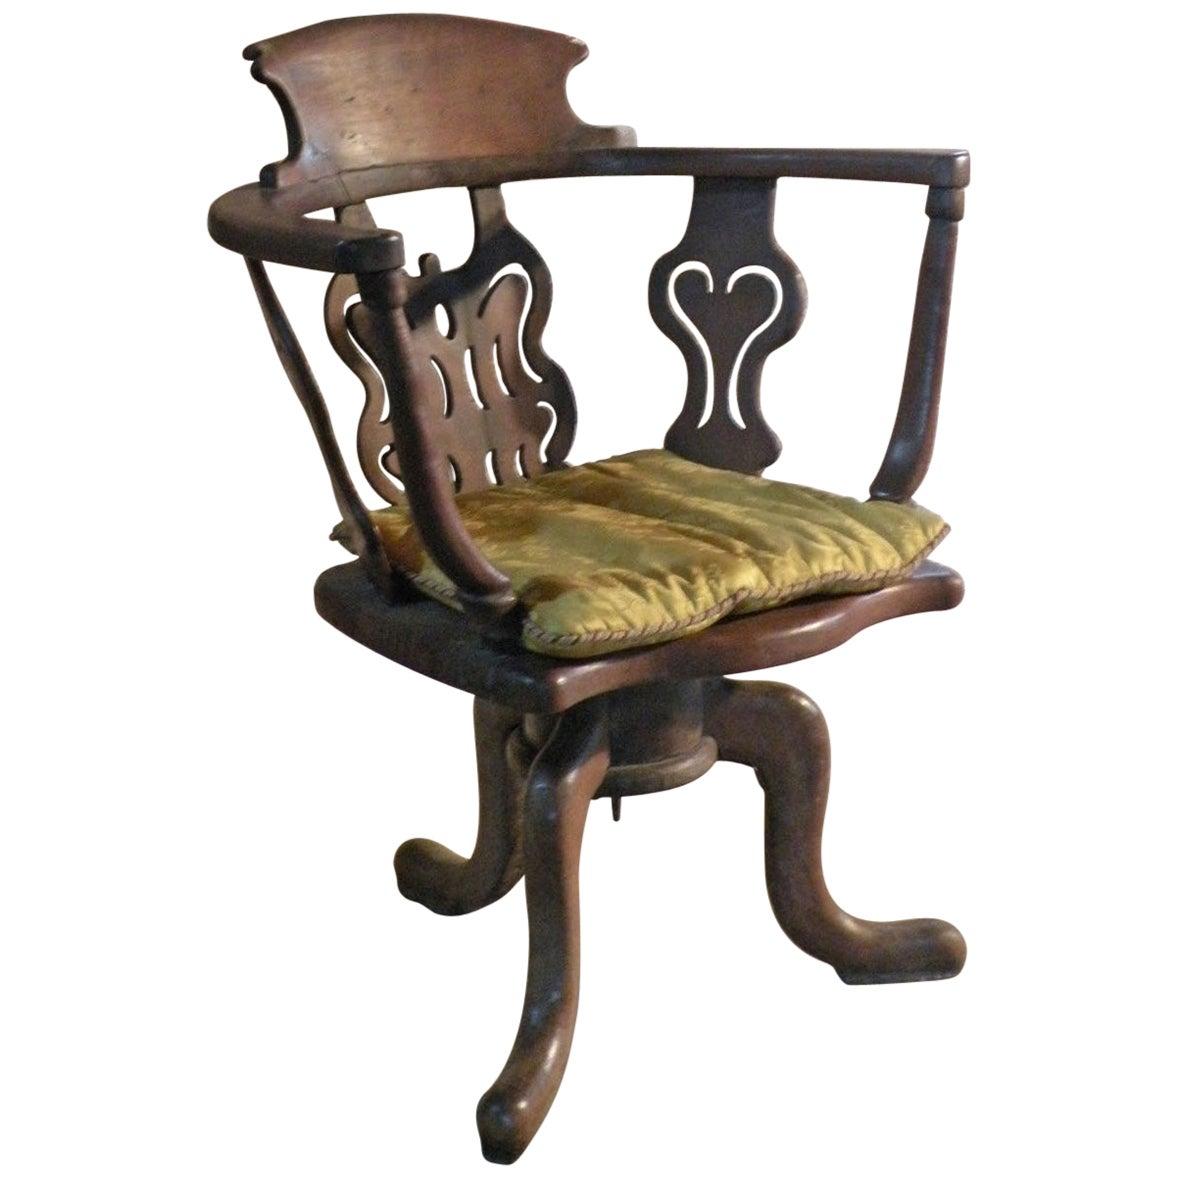 Italian Late Baroque 18th Century Walnut Swivel or Desk Chair of Rare Form